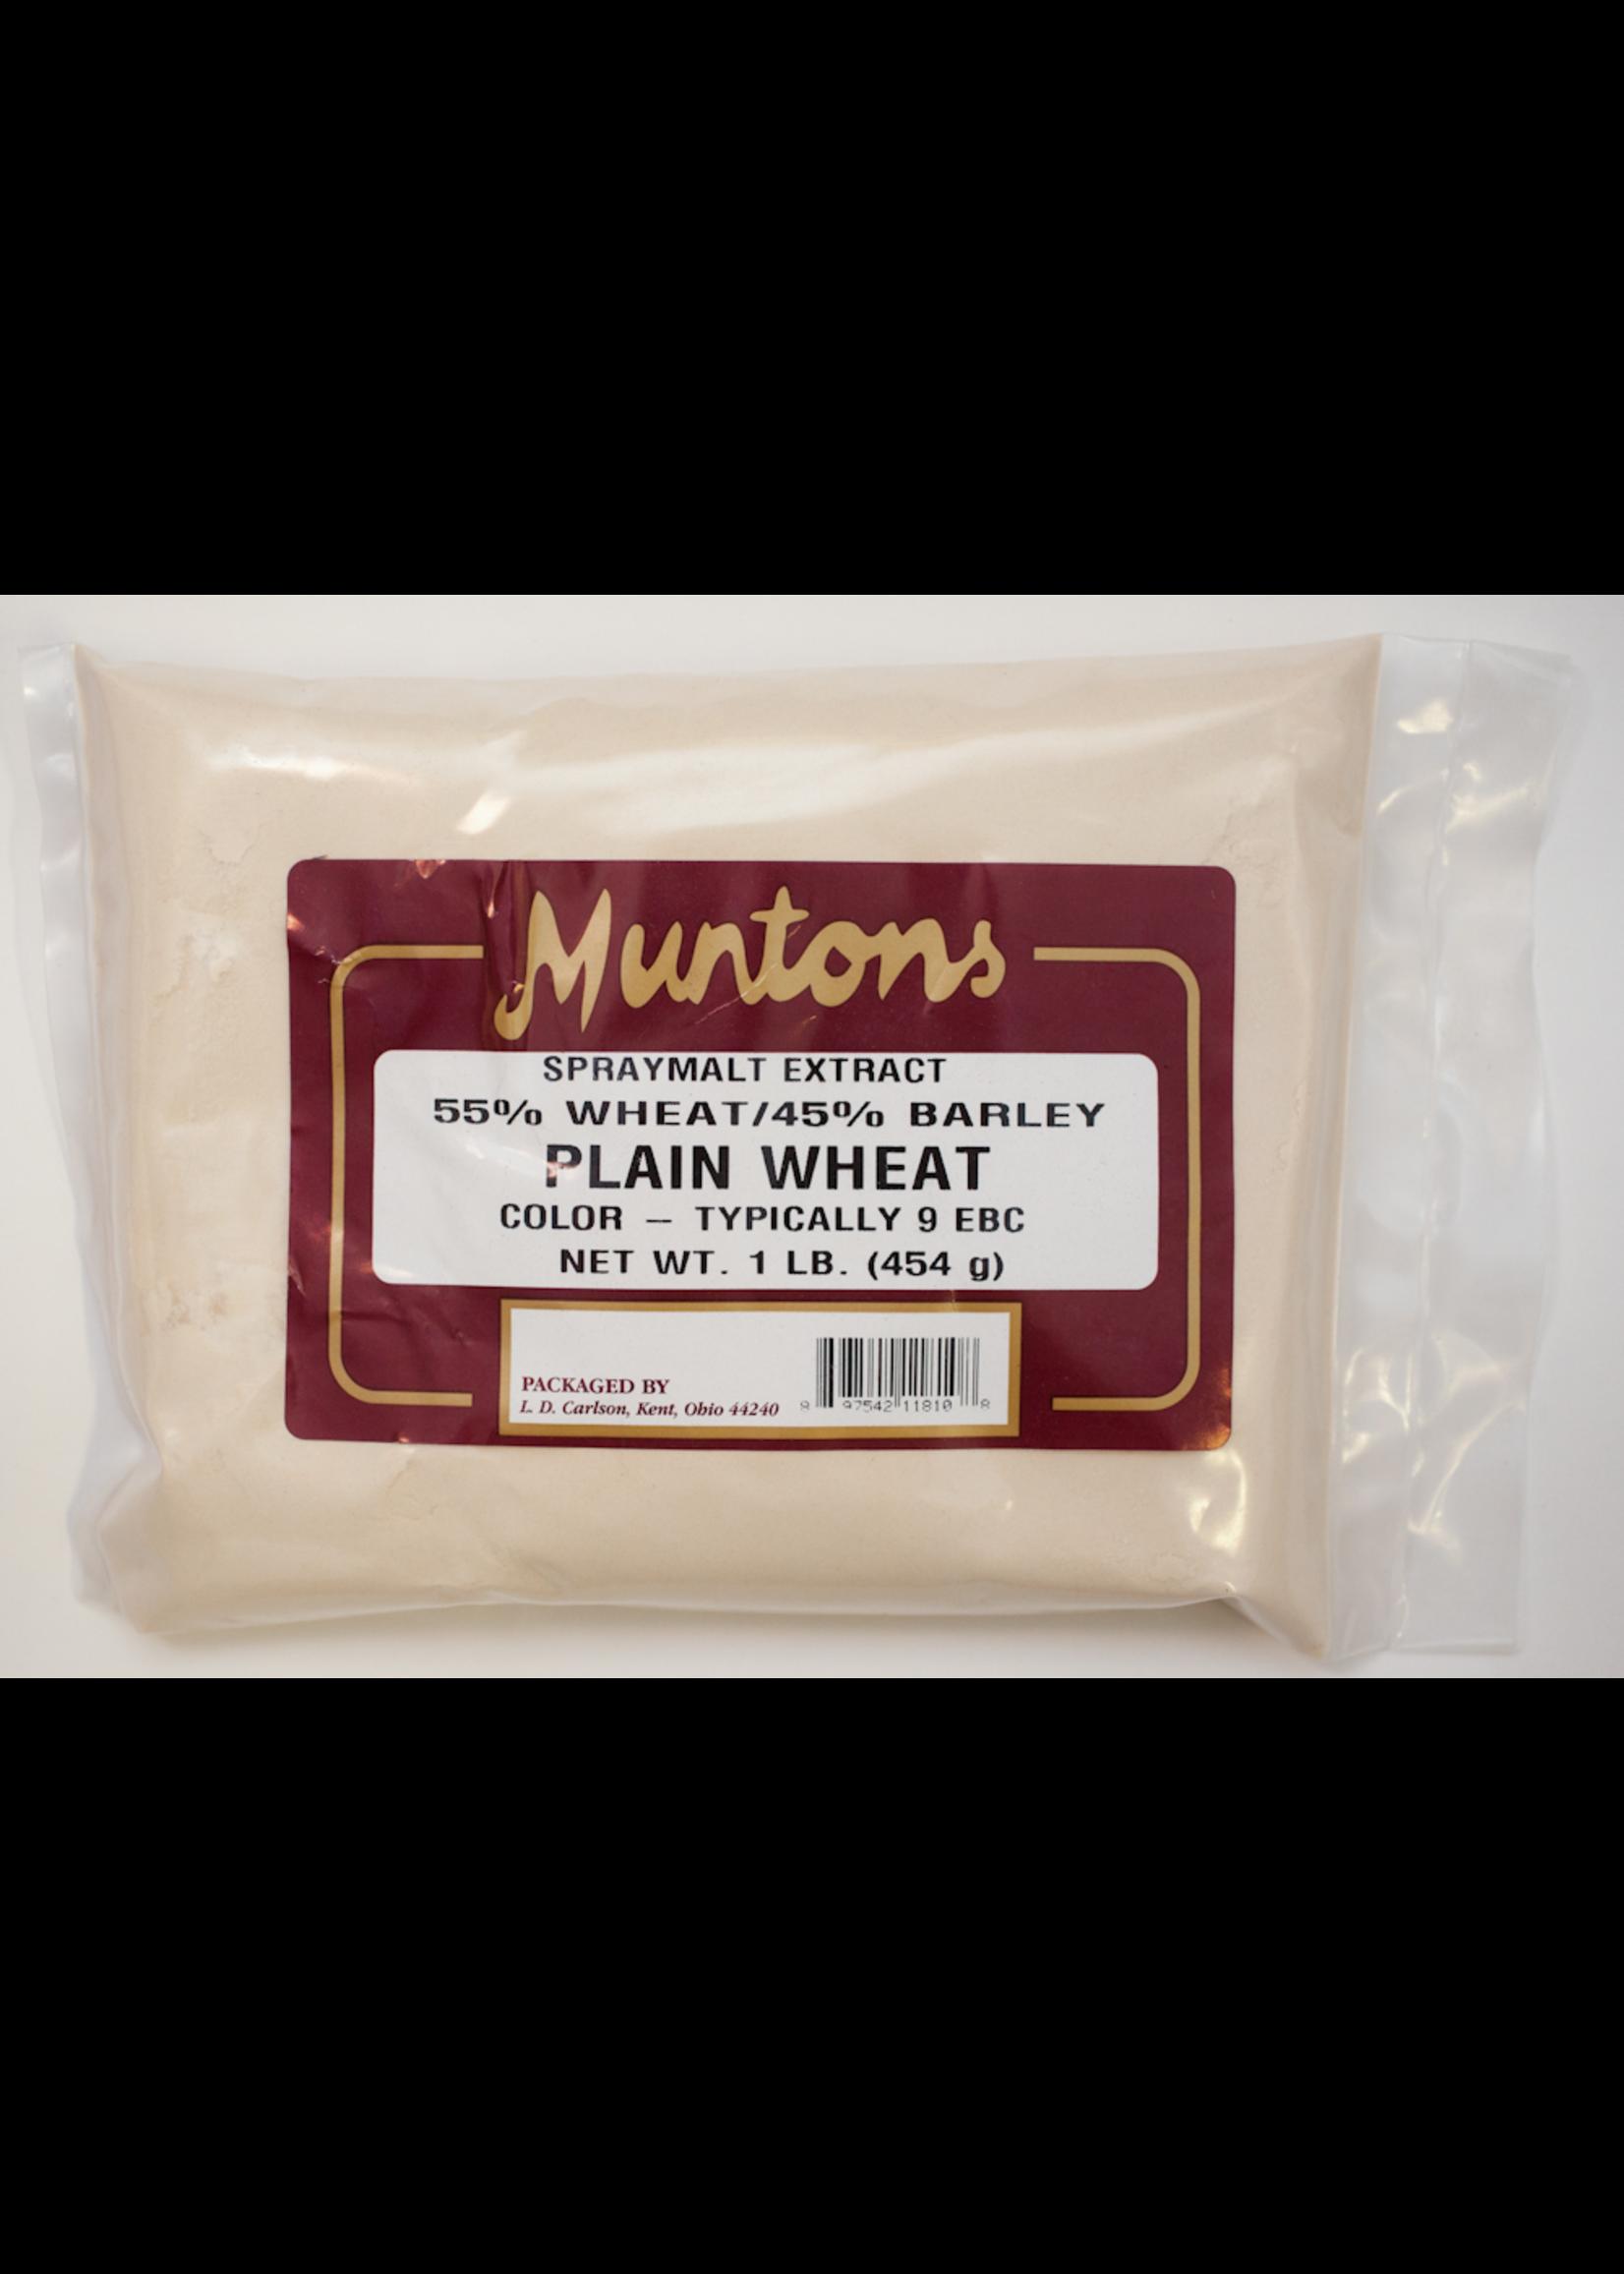 Extracts/Adjuncts Muntons Plain Wheat Spraymalt Dry Malt Extract (DME) - 1 LB